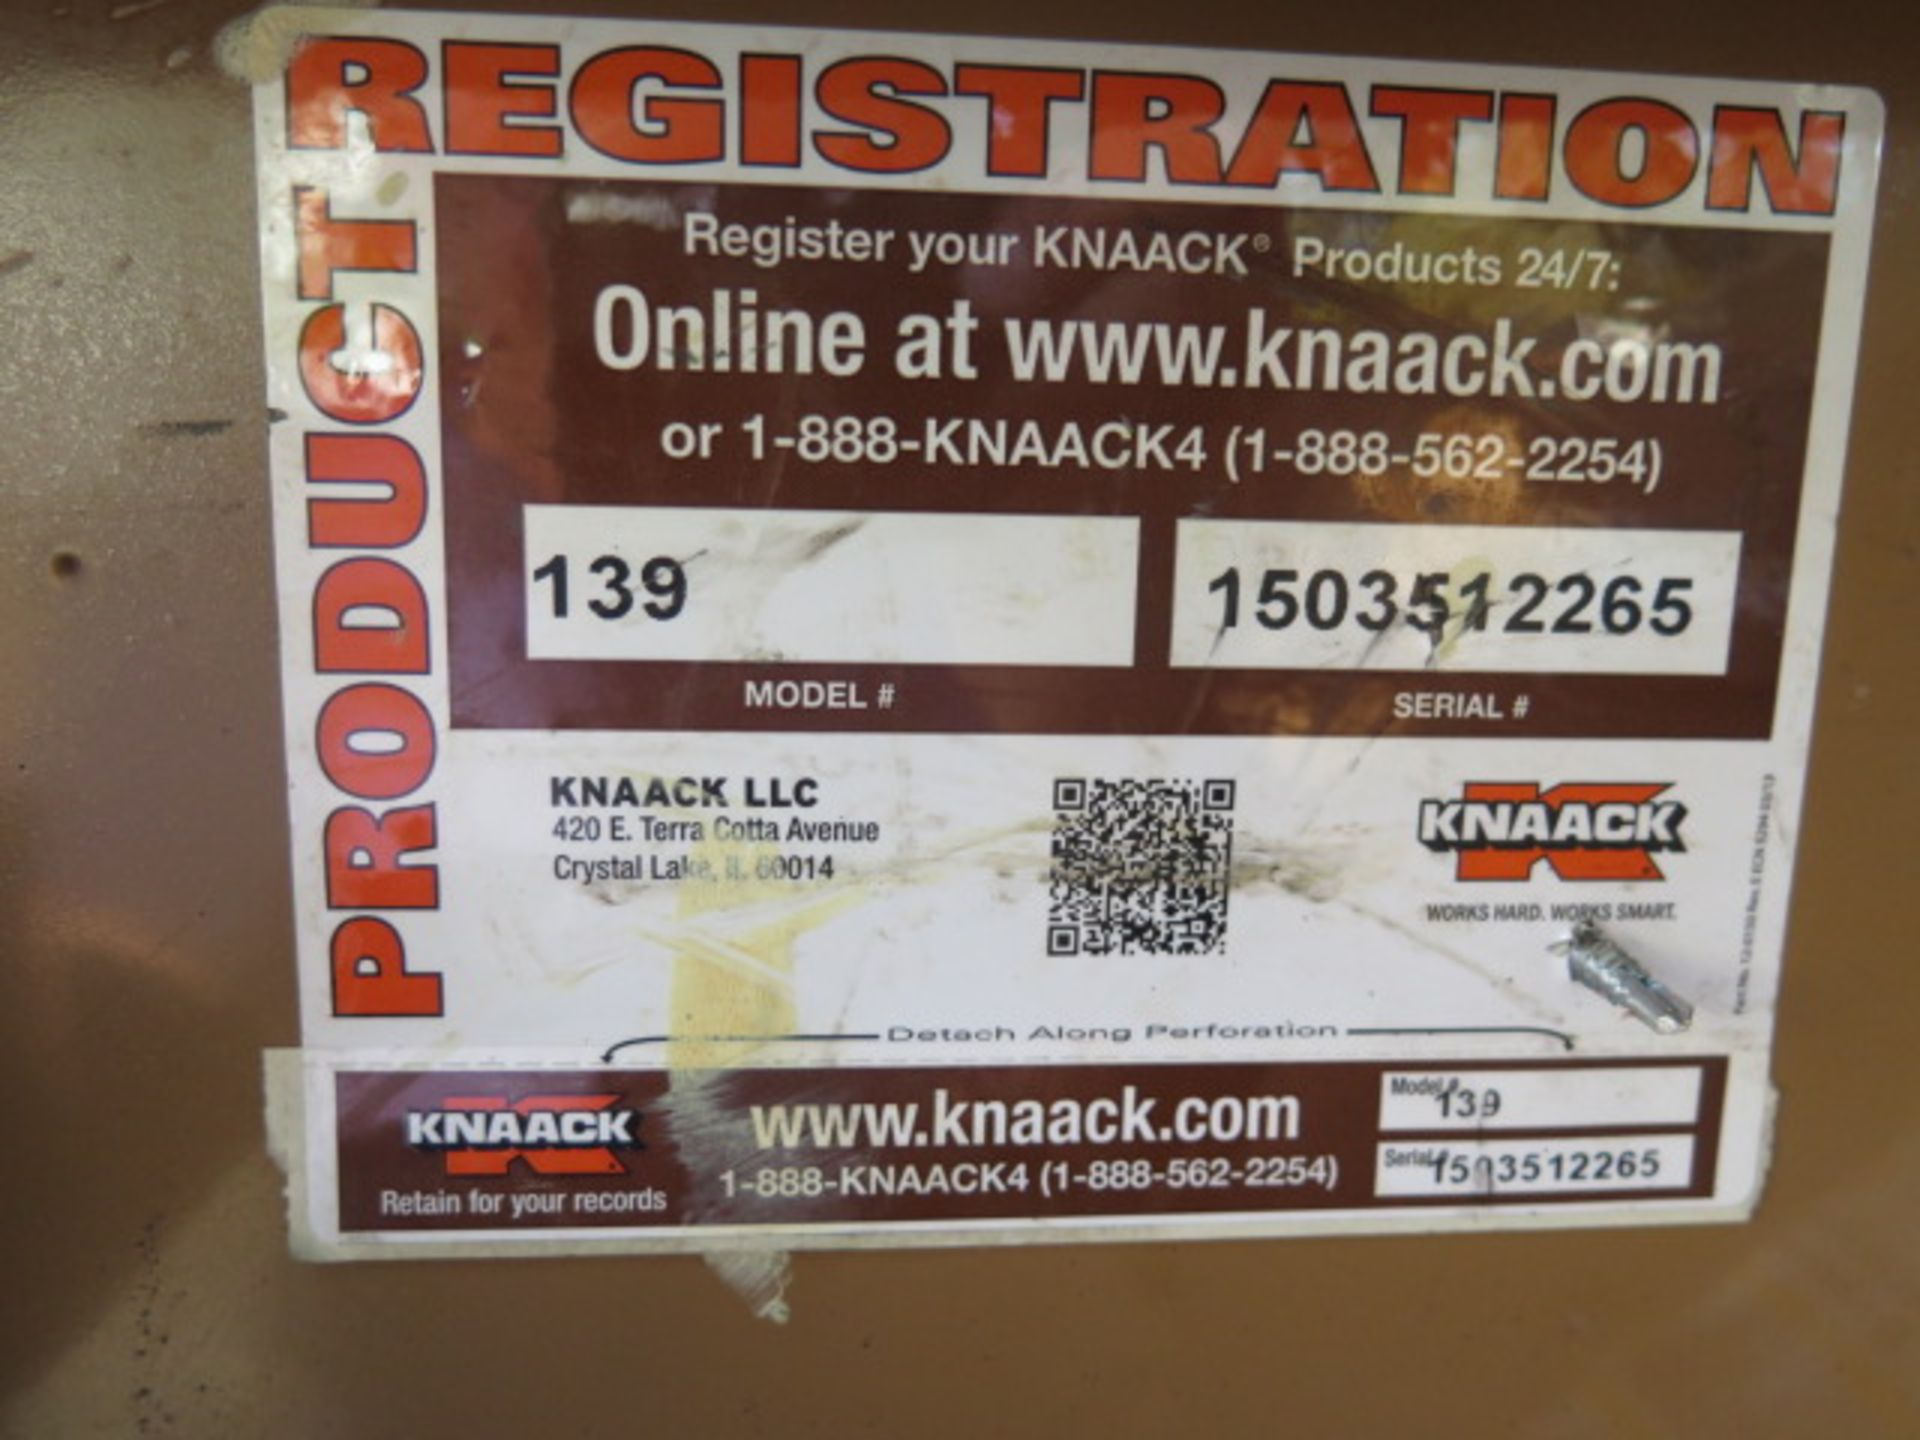 Knaack mdl. 139 Jobmaster Job Box (SOLD AS-IS - NO WARRANTY) - Image 17 of 17